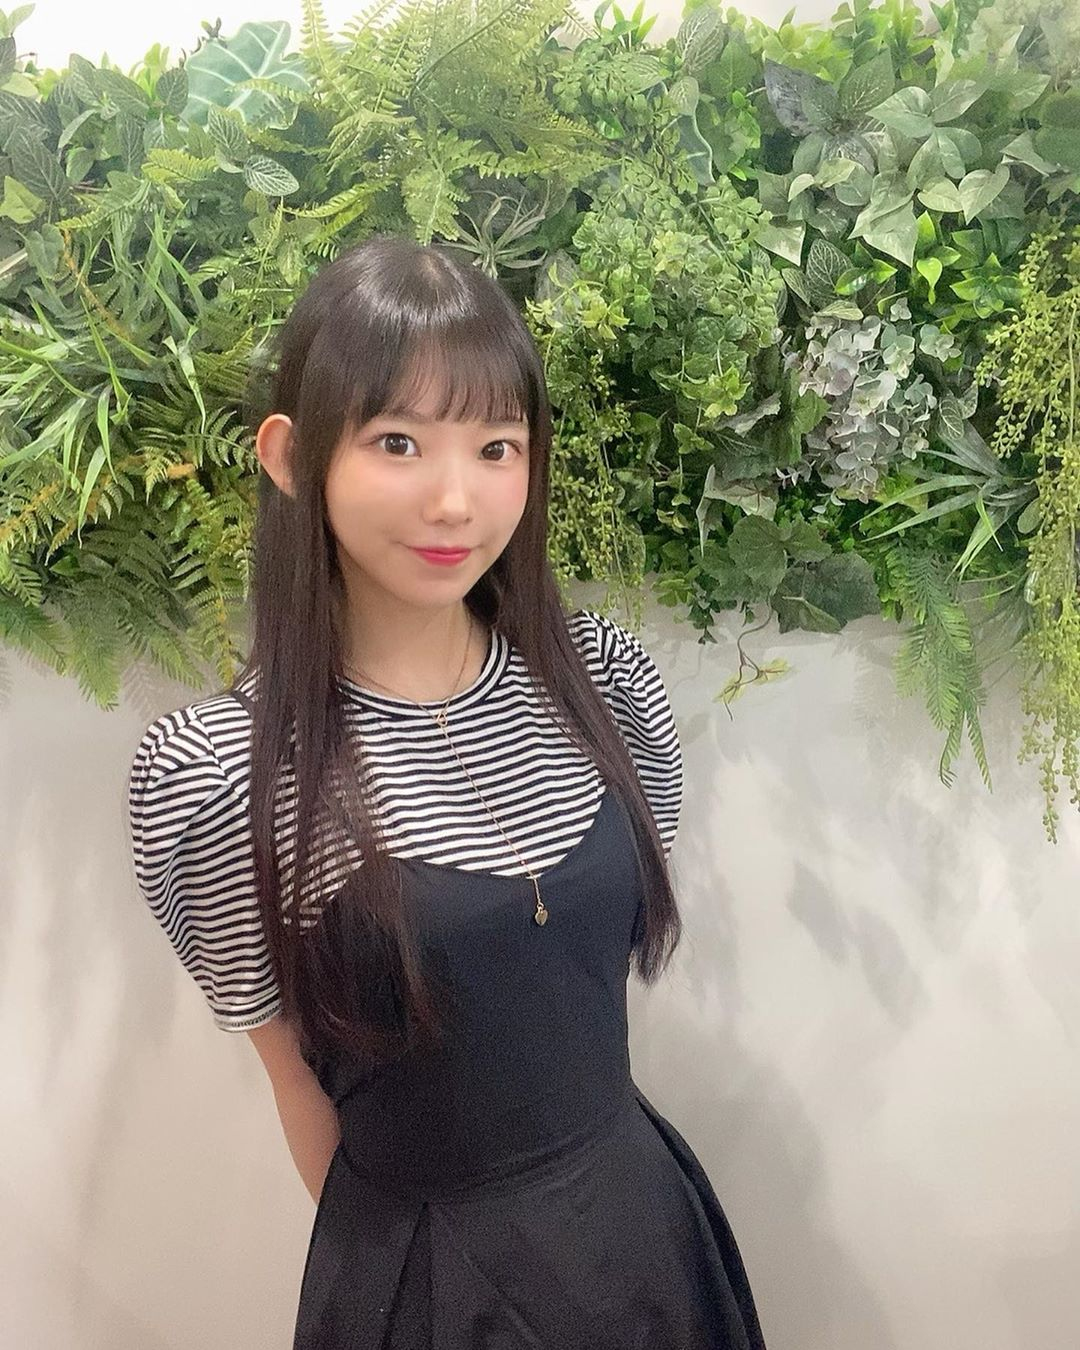 nagasawa_marina072.jpg